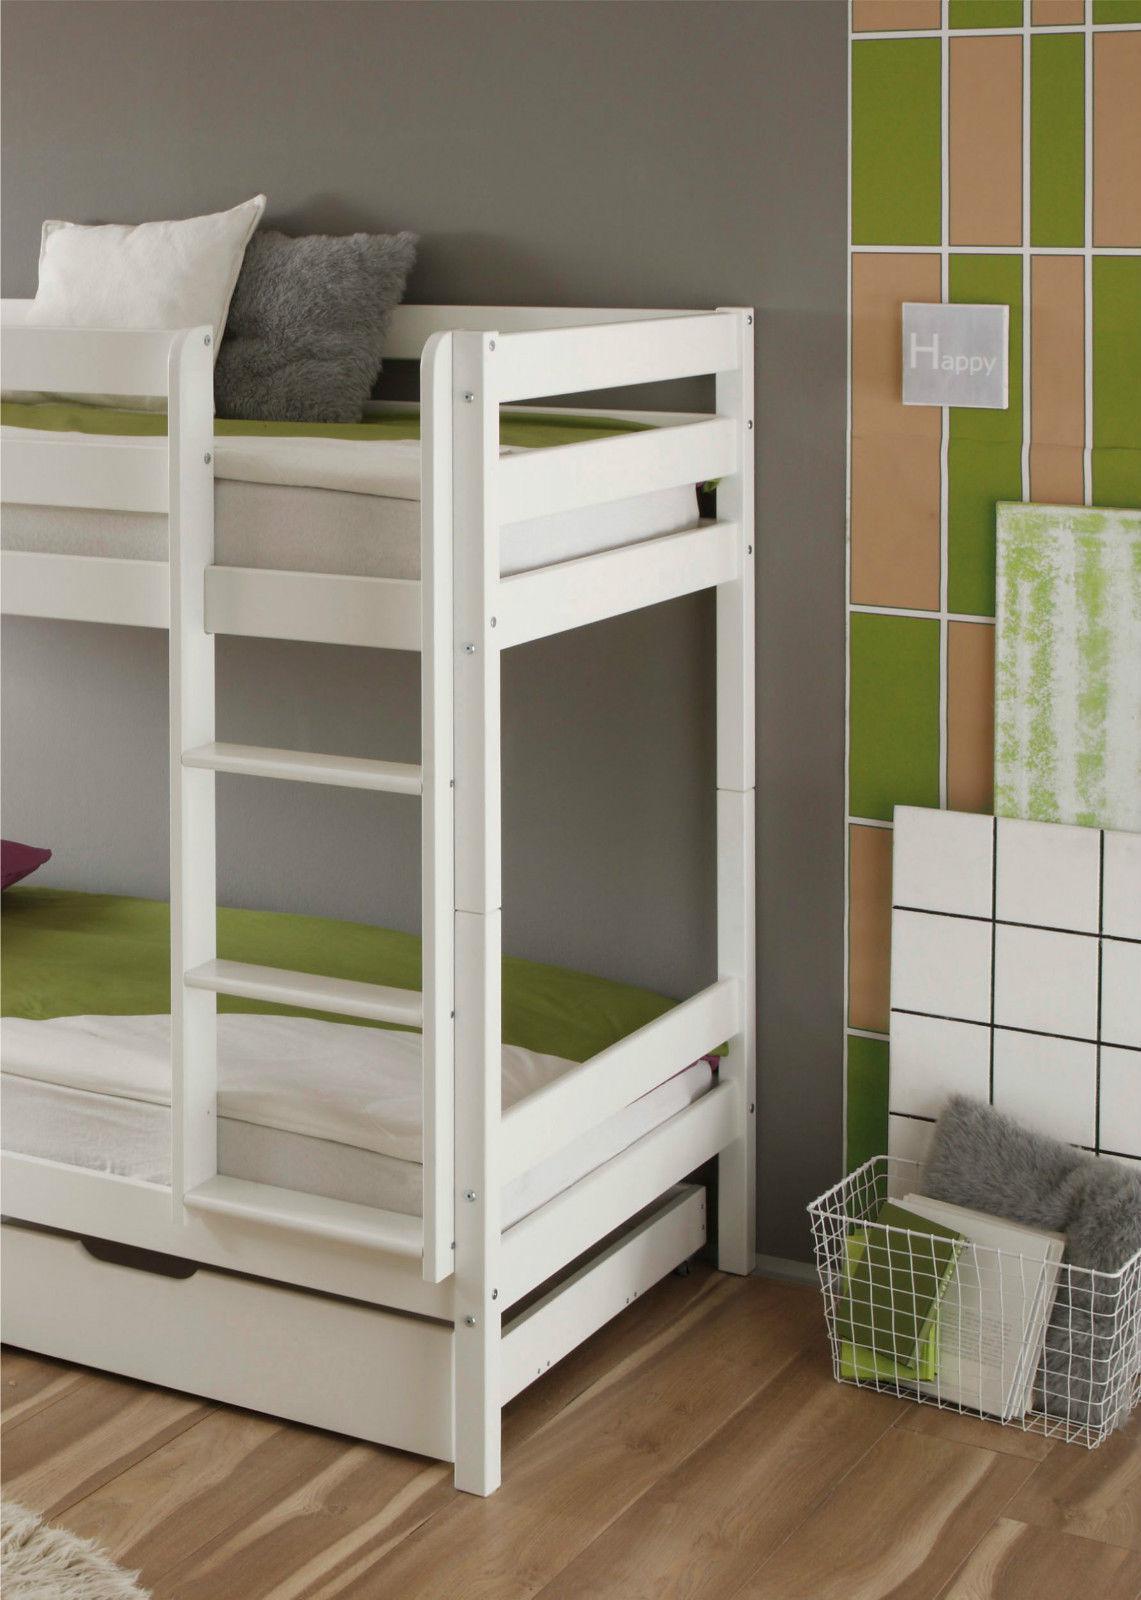 hochbett teilbar lilashouse. Black Bedroom Furniture Sets. Home Design Ideas